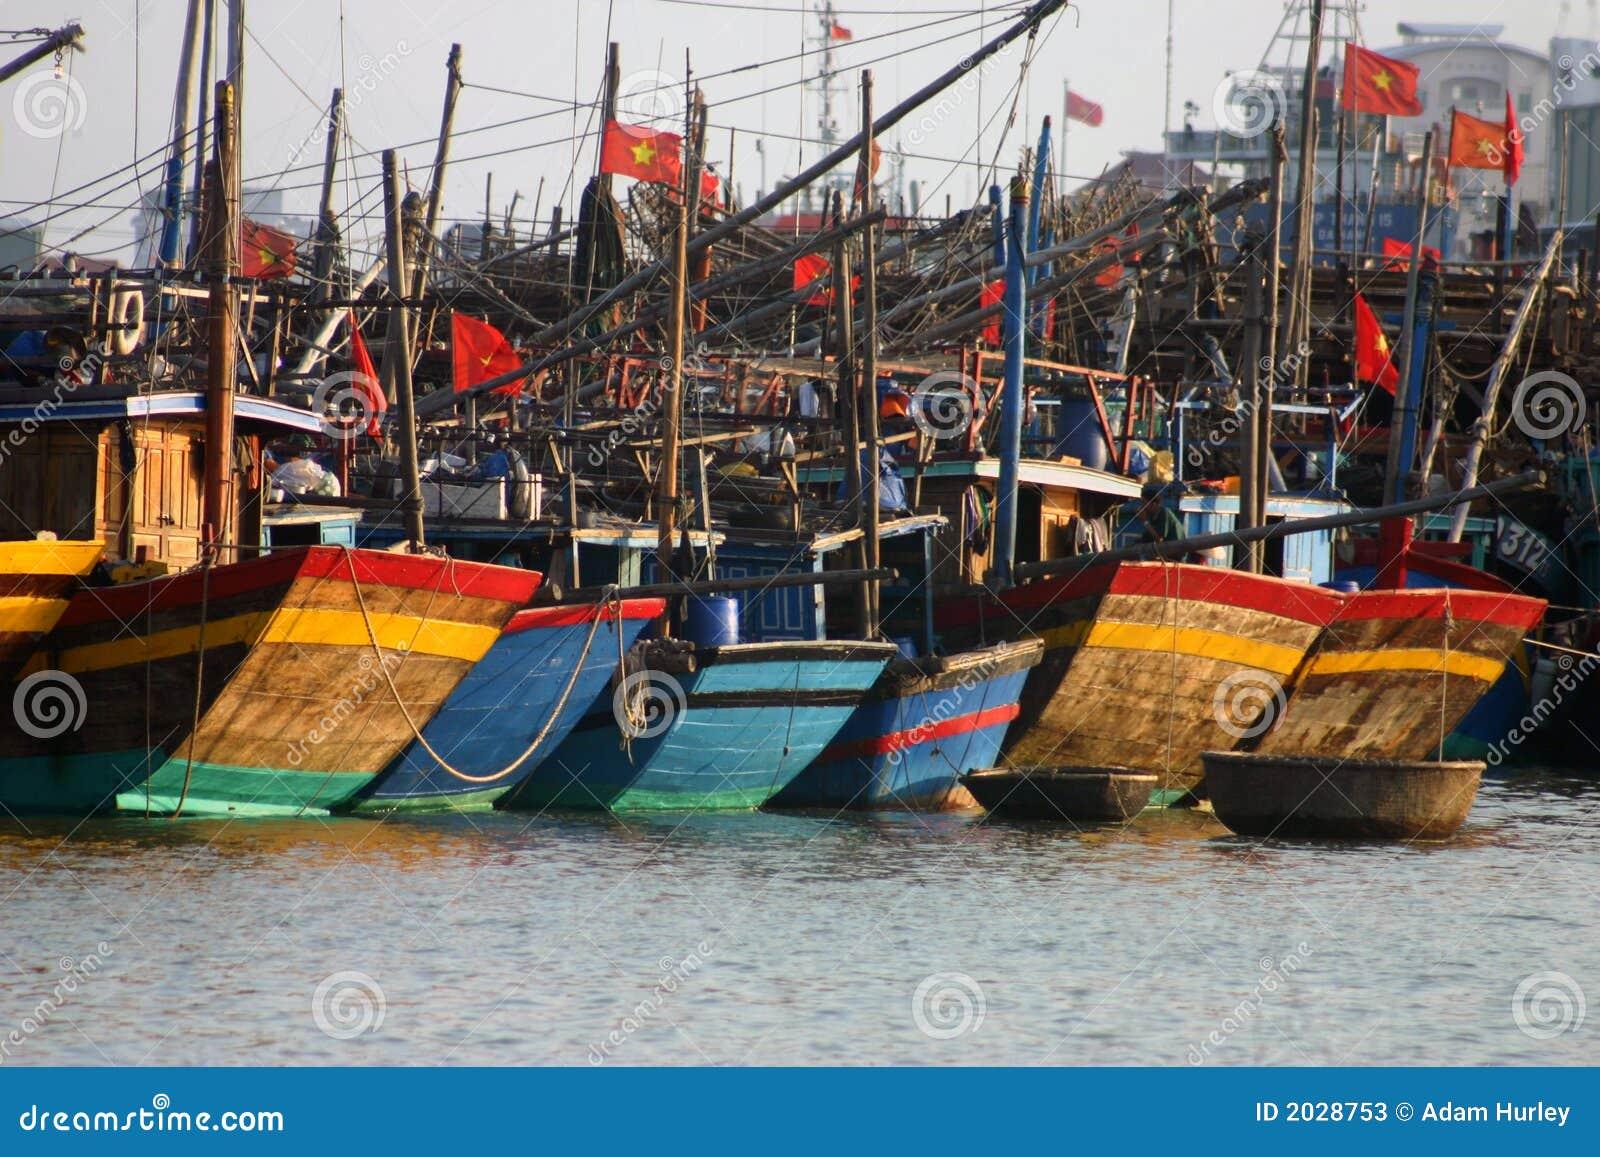 Fishing Boats, Danang Vietnam